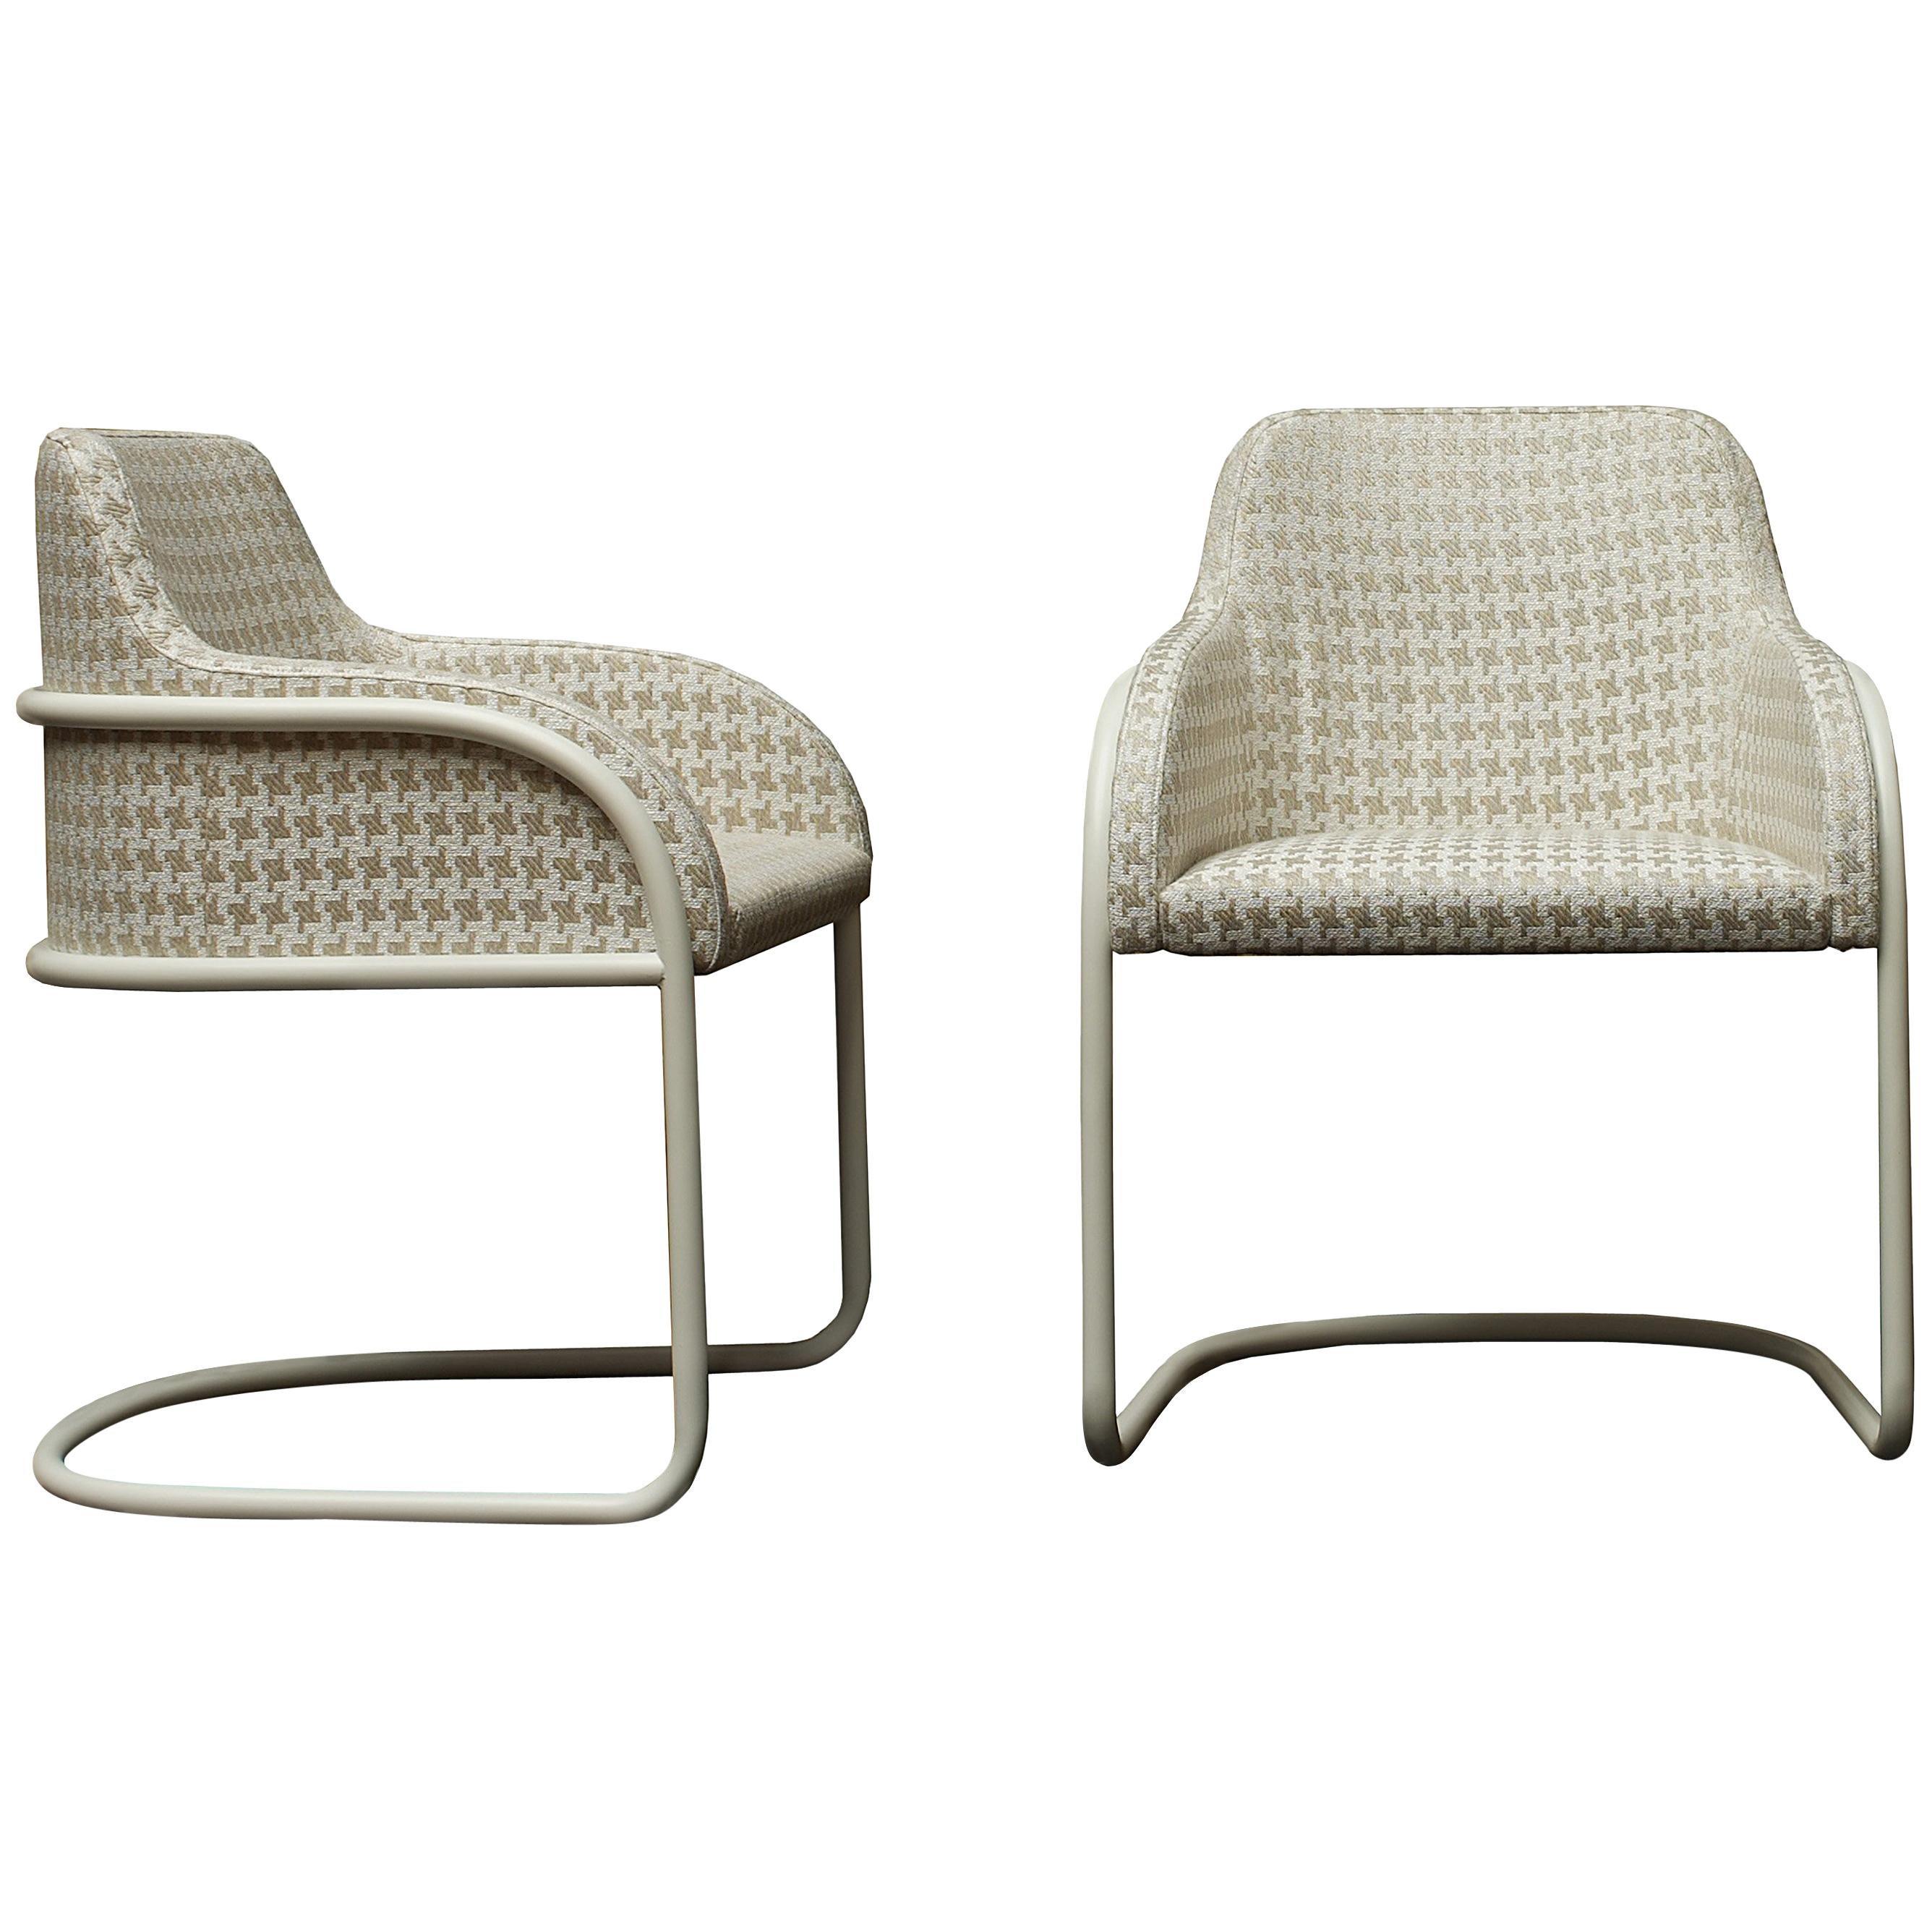 Nube Italia Stream Armchair in Cream Blend Fabric by Marco Corti